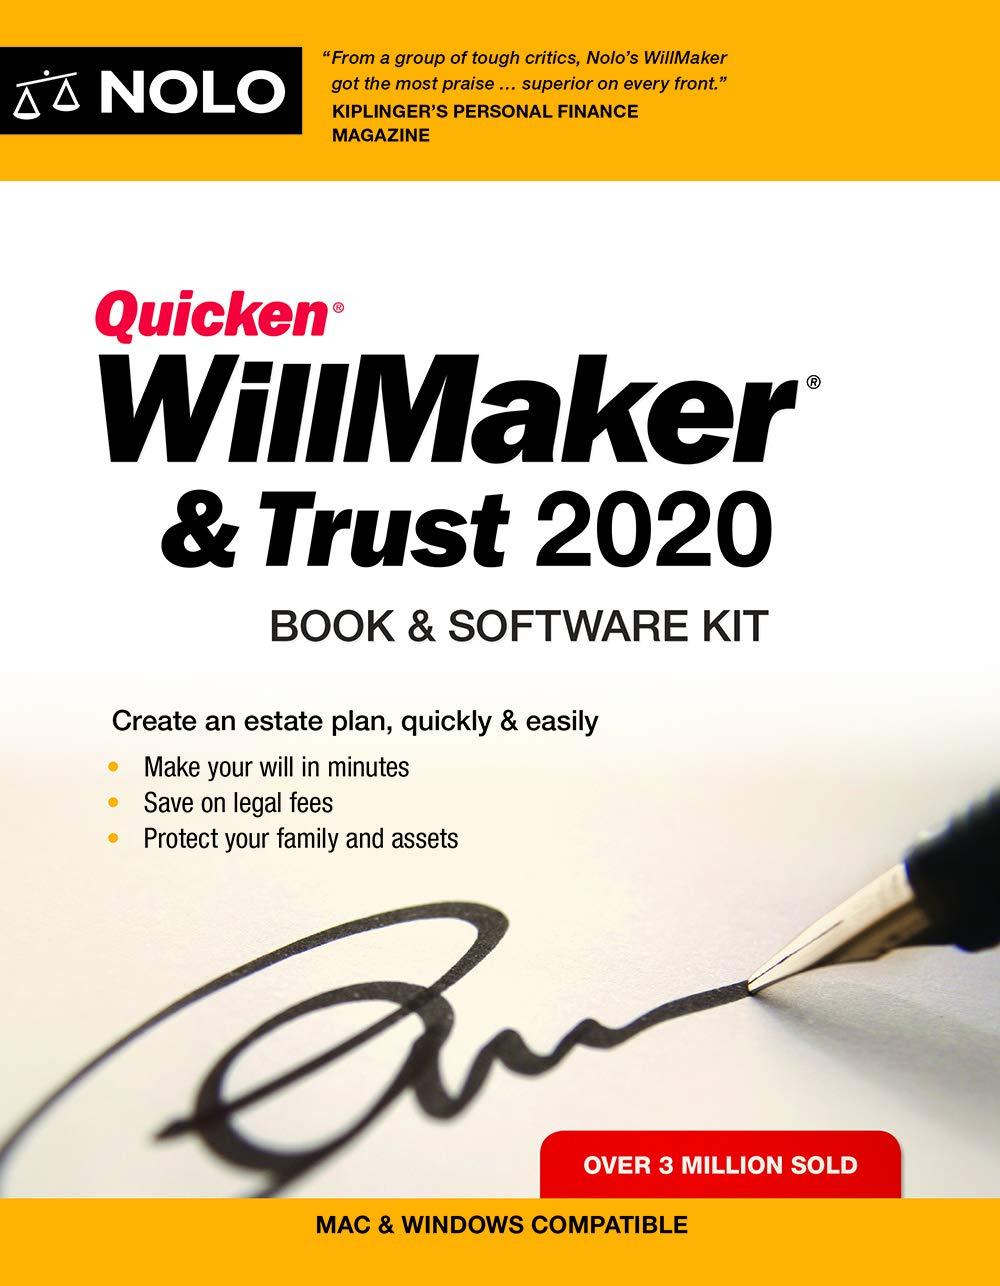 Quicken Willmaker & Trust 2020: Book & Software Kit by NOLO